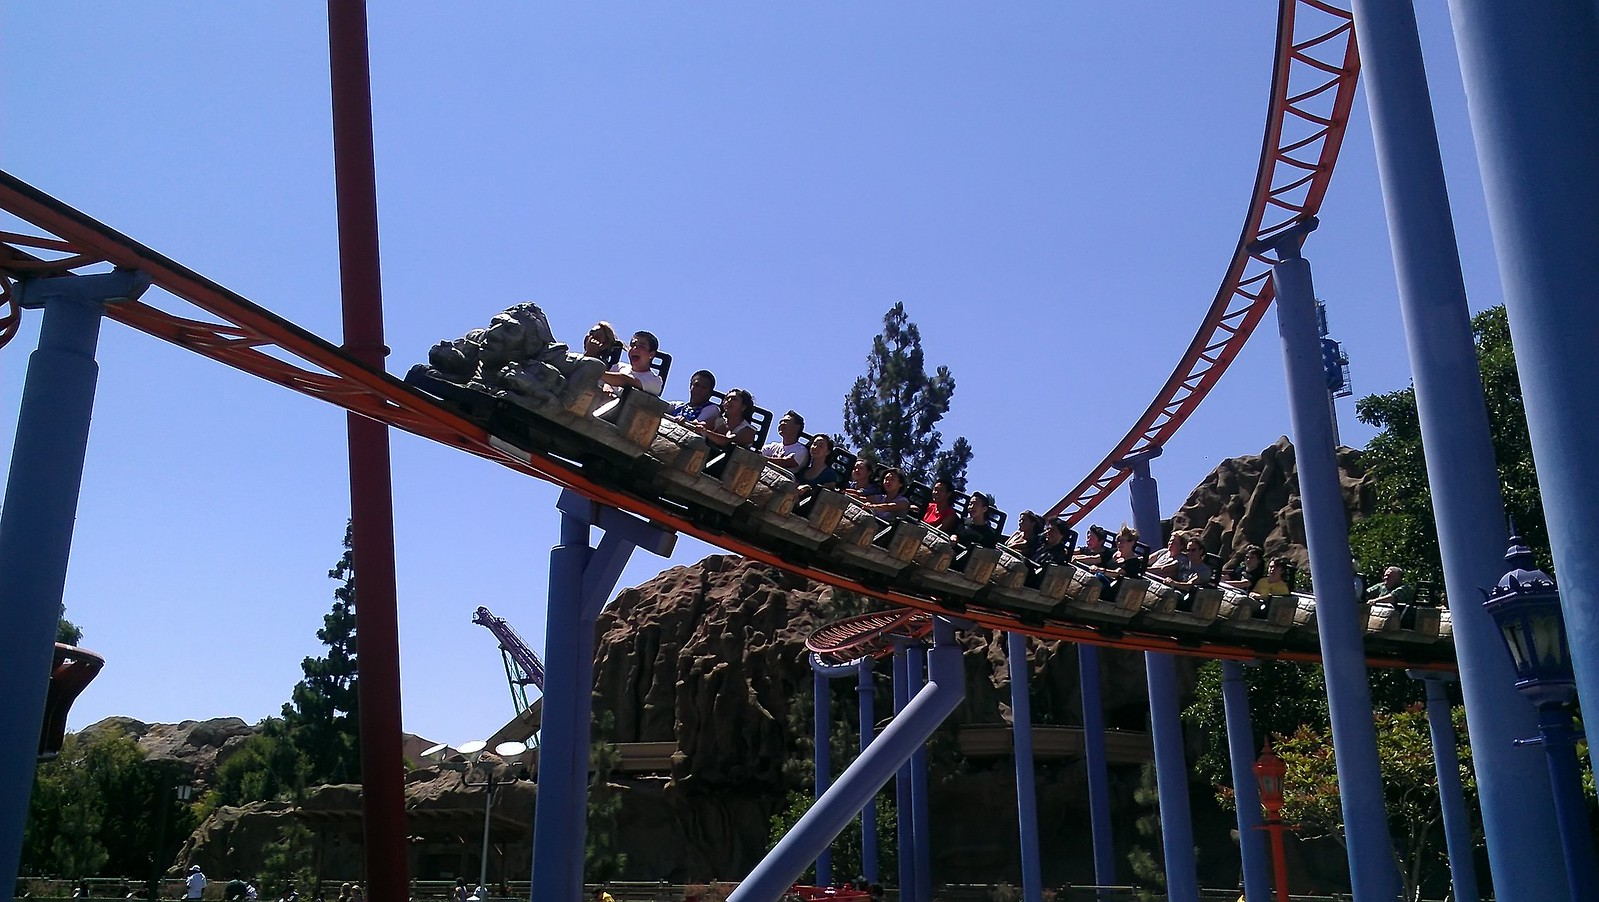 jaguar roller coaster - photo #13